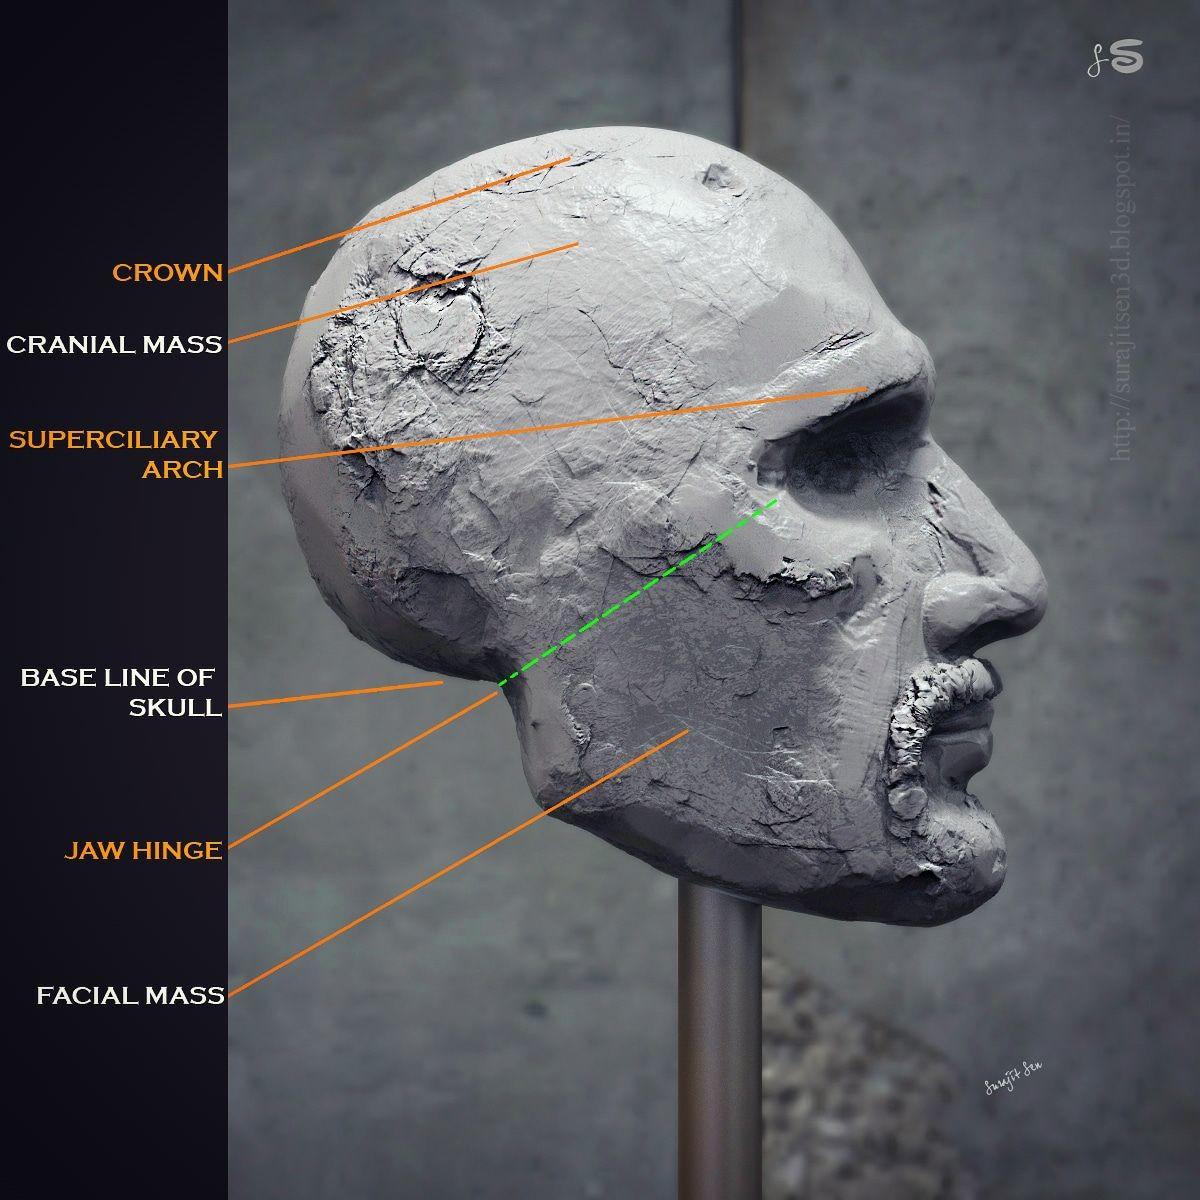 #humanheadrsculpture #study #anatomy  My free time study Base line of human head. Wish to share.